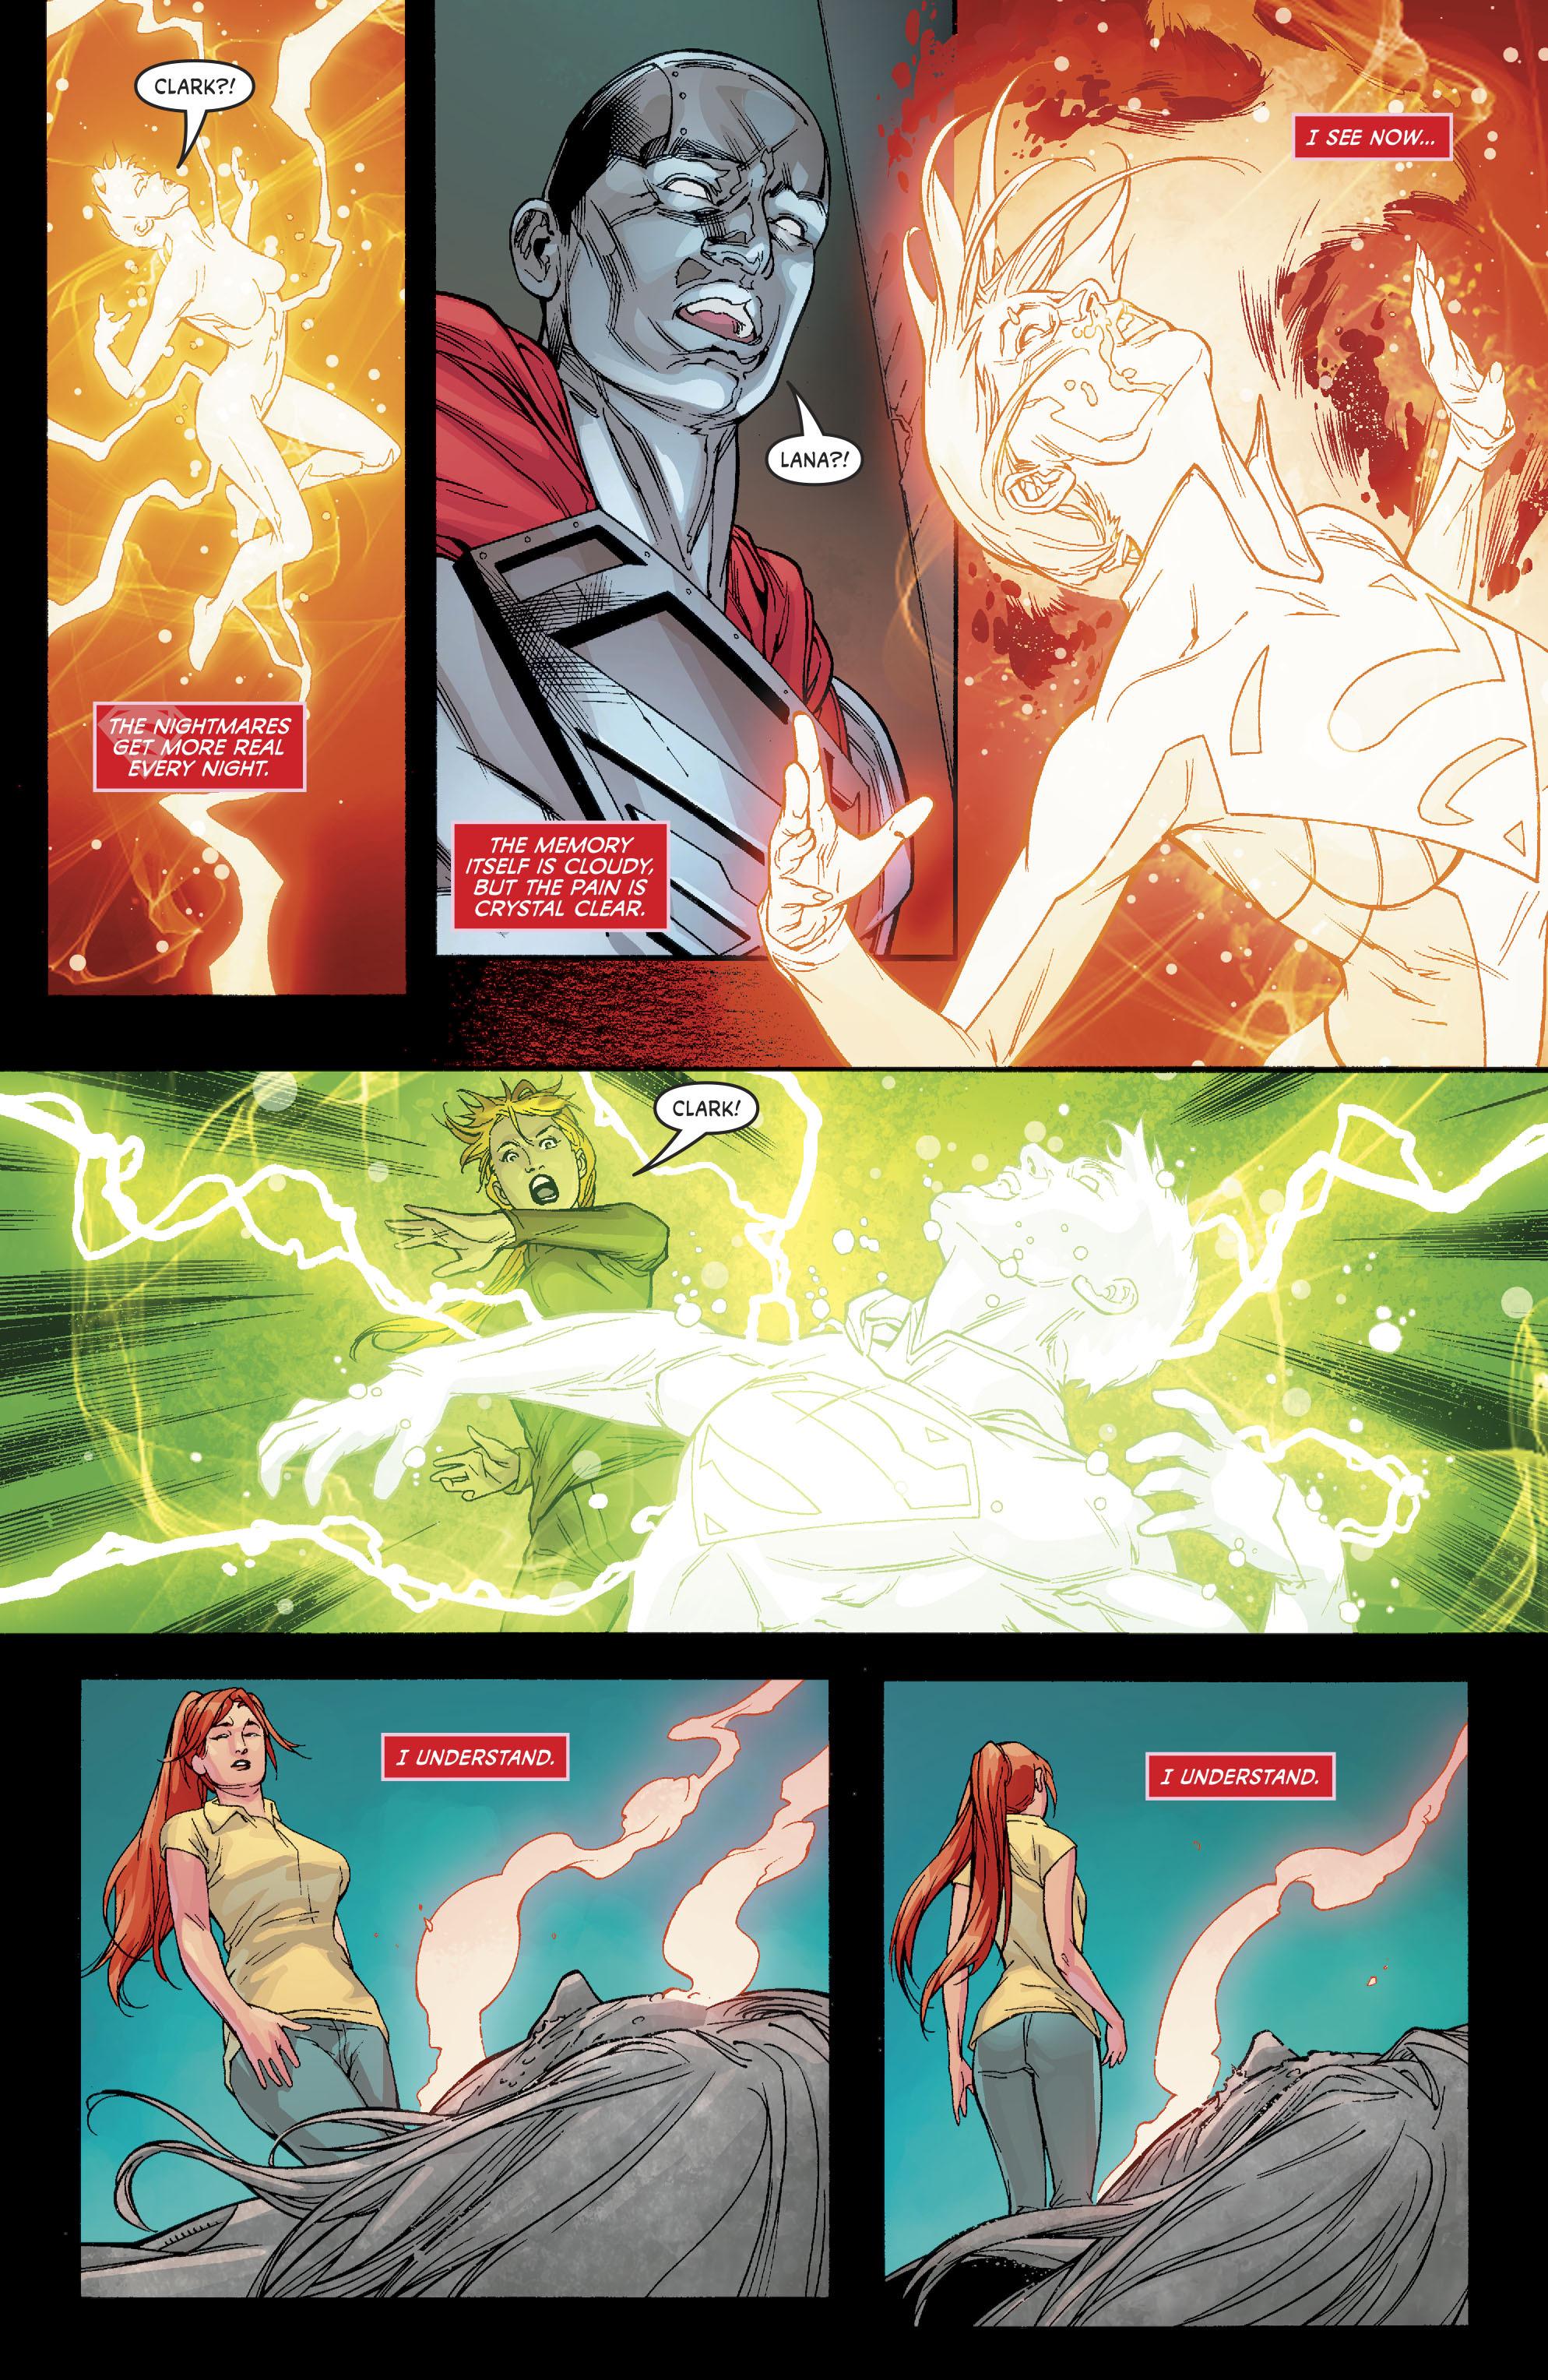 Read online Superwoman comic -  Issue #10 - 9